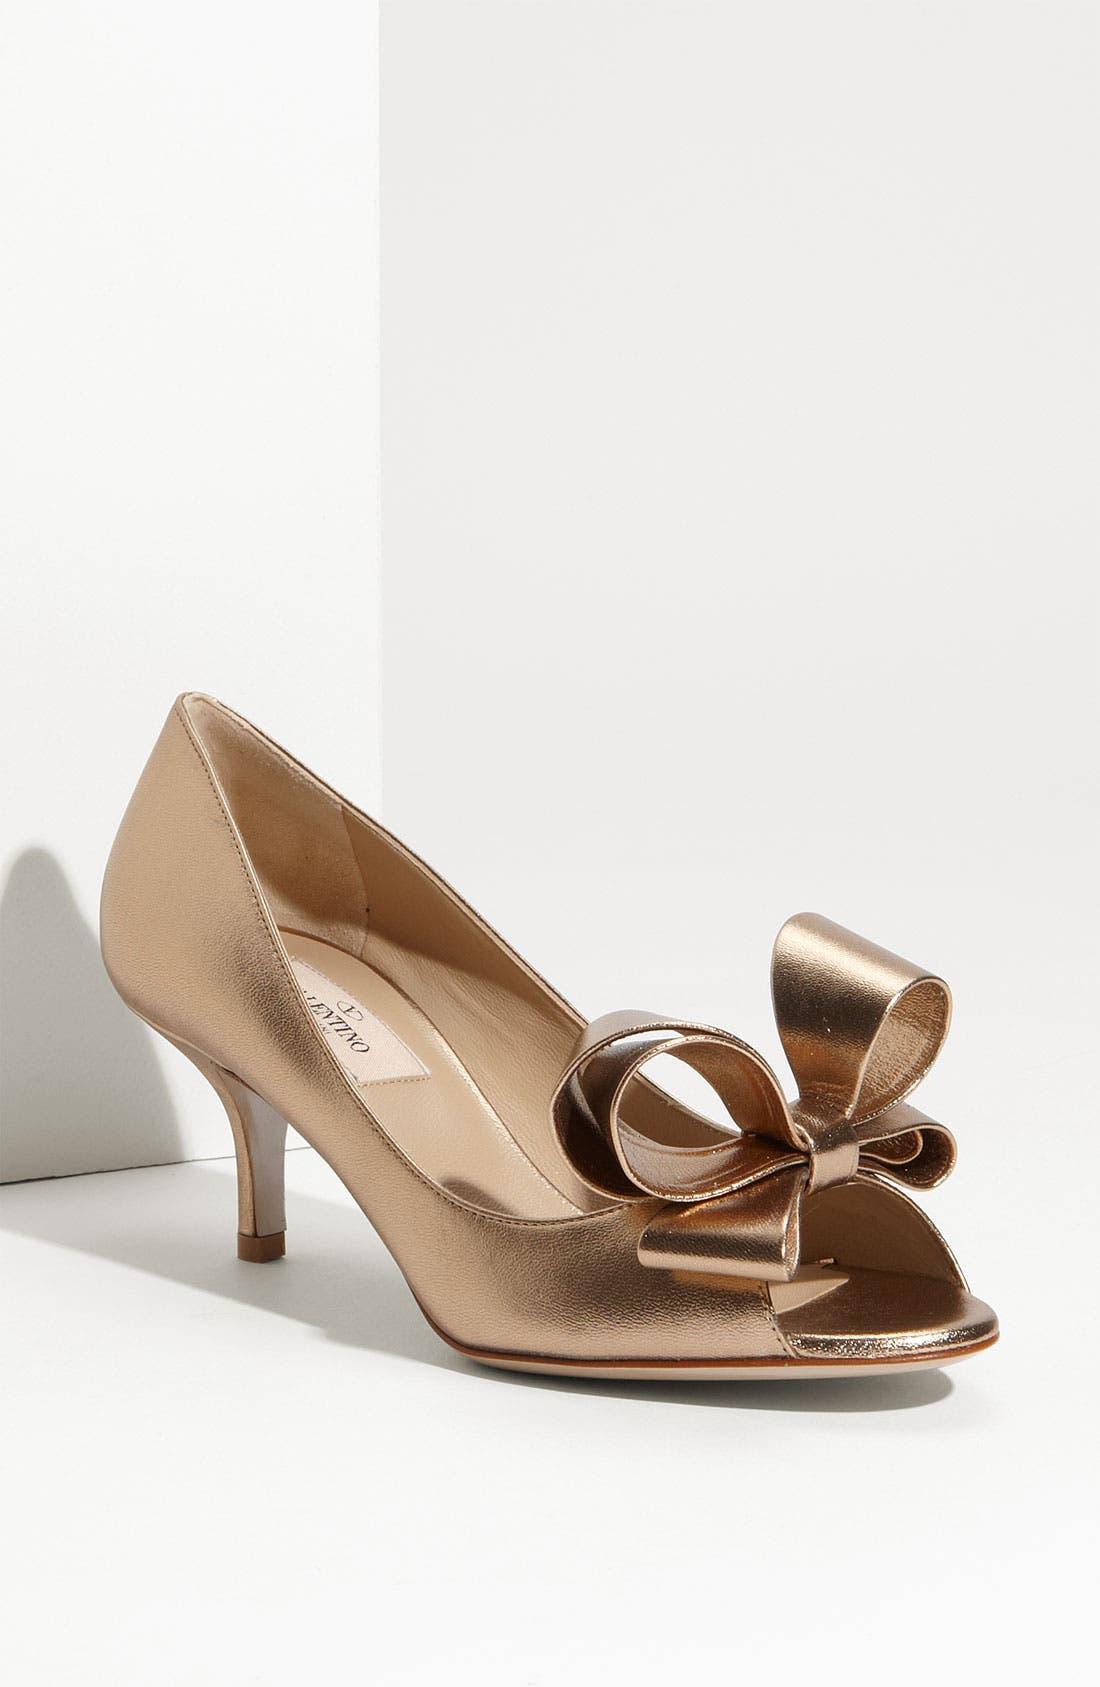 Alternate Image 1 Selected - VALENTINO GARAVANI Metallic Nappa Couture Bow Pump